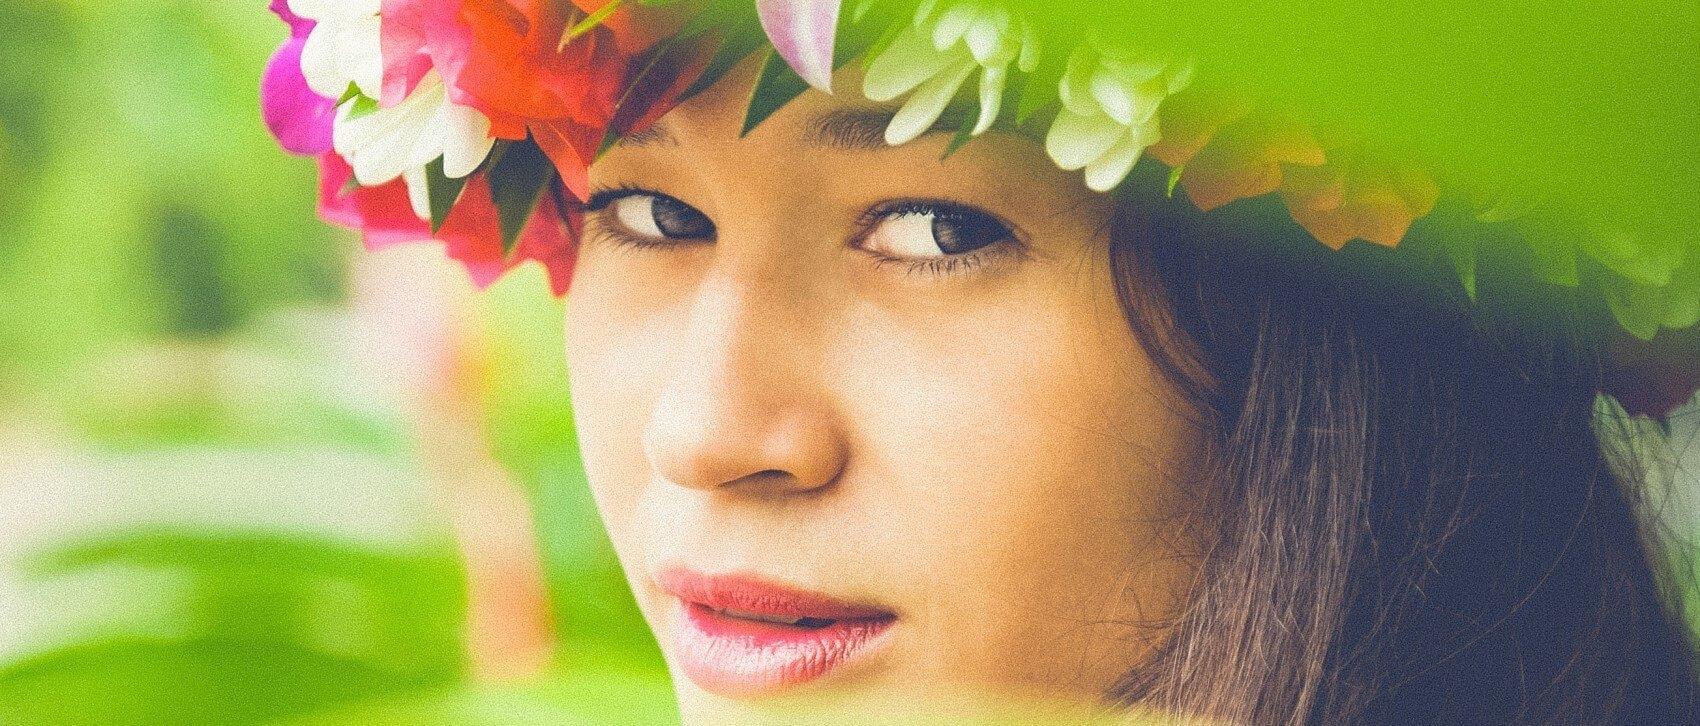 marc-gerard-photographe-mariage-montpellier-mode-tahiti-10